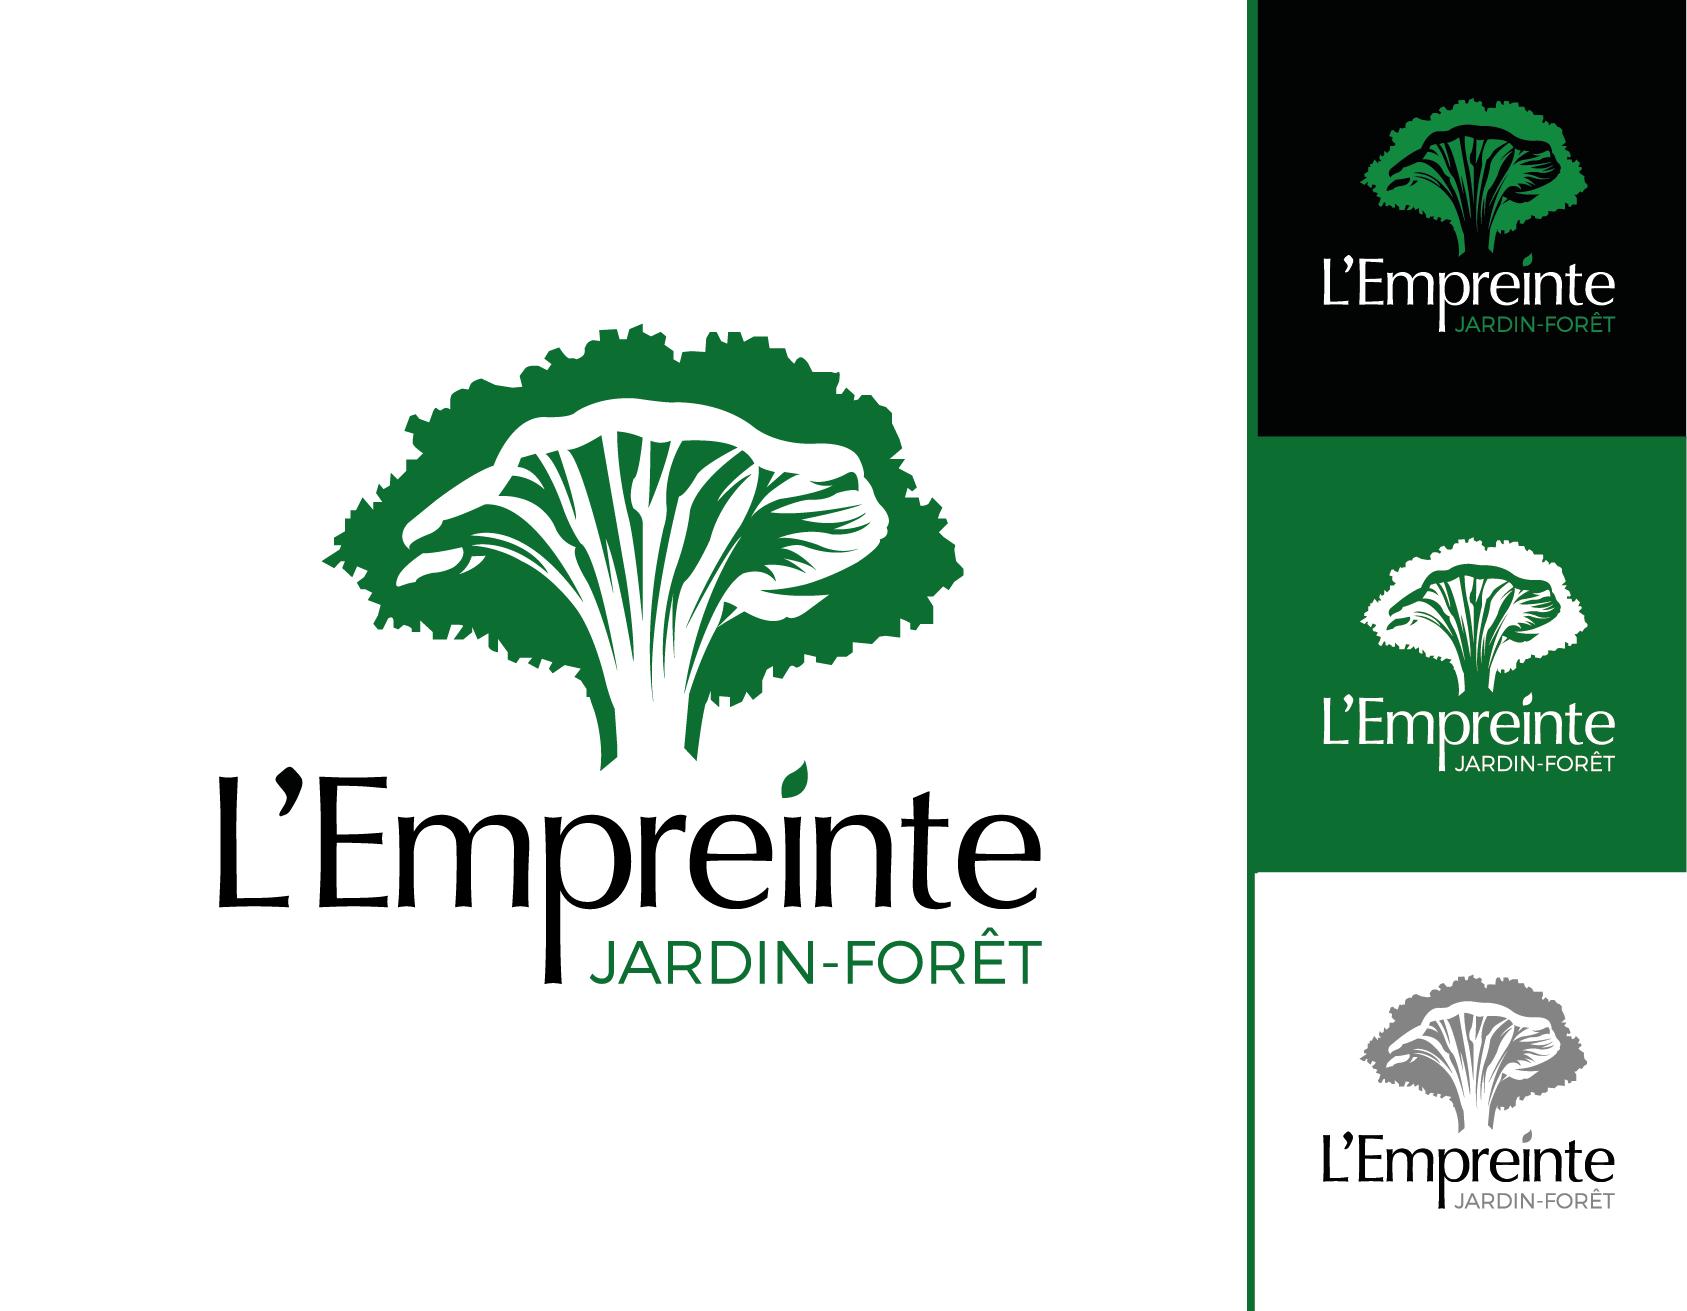 2017LogoEmpreinte-Final-01.png